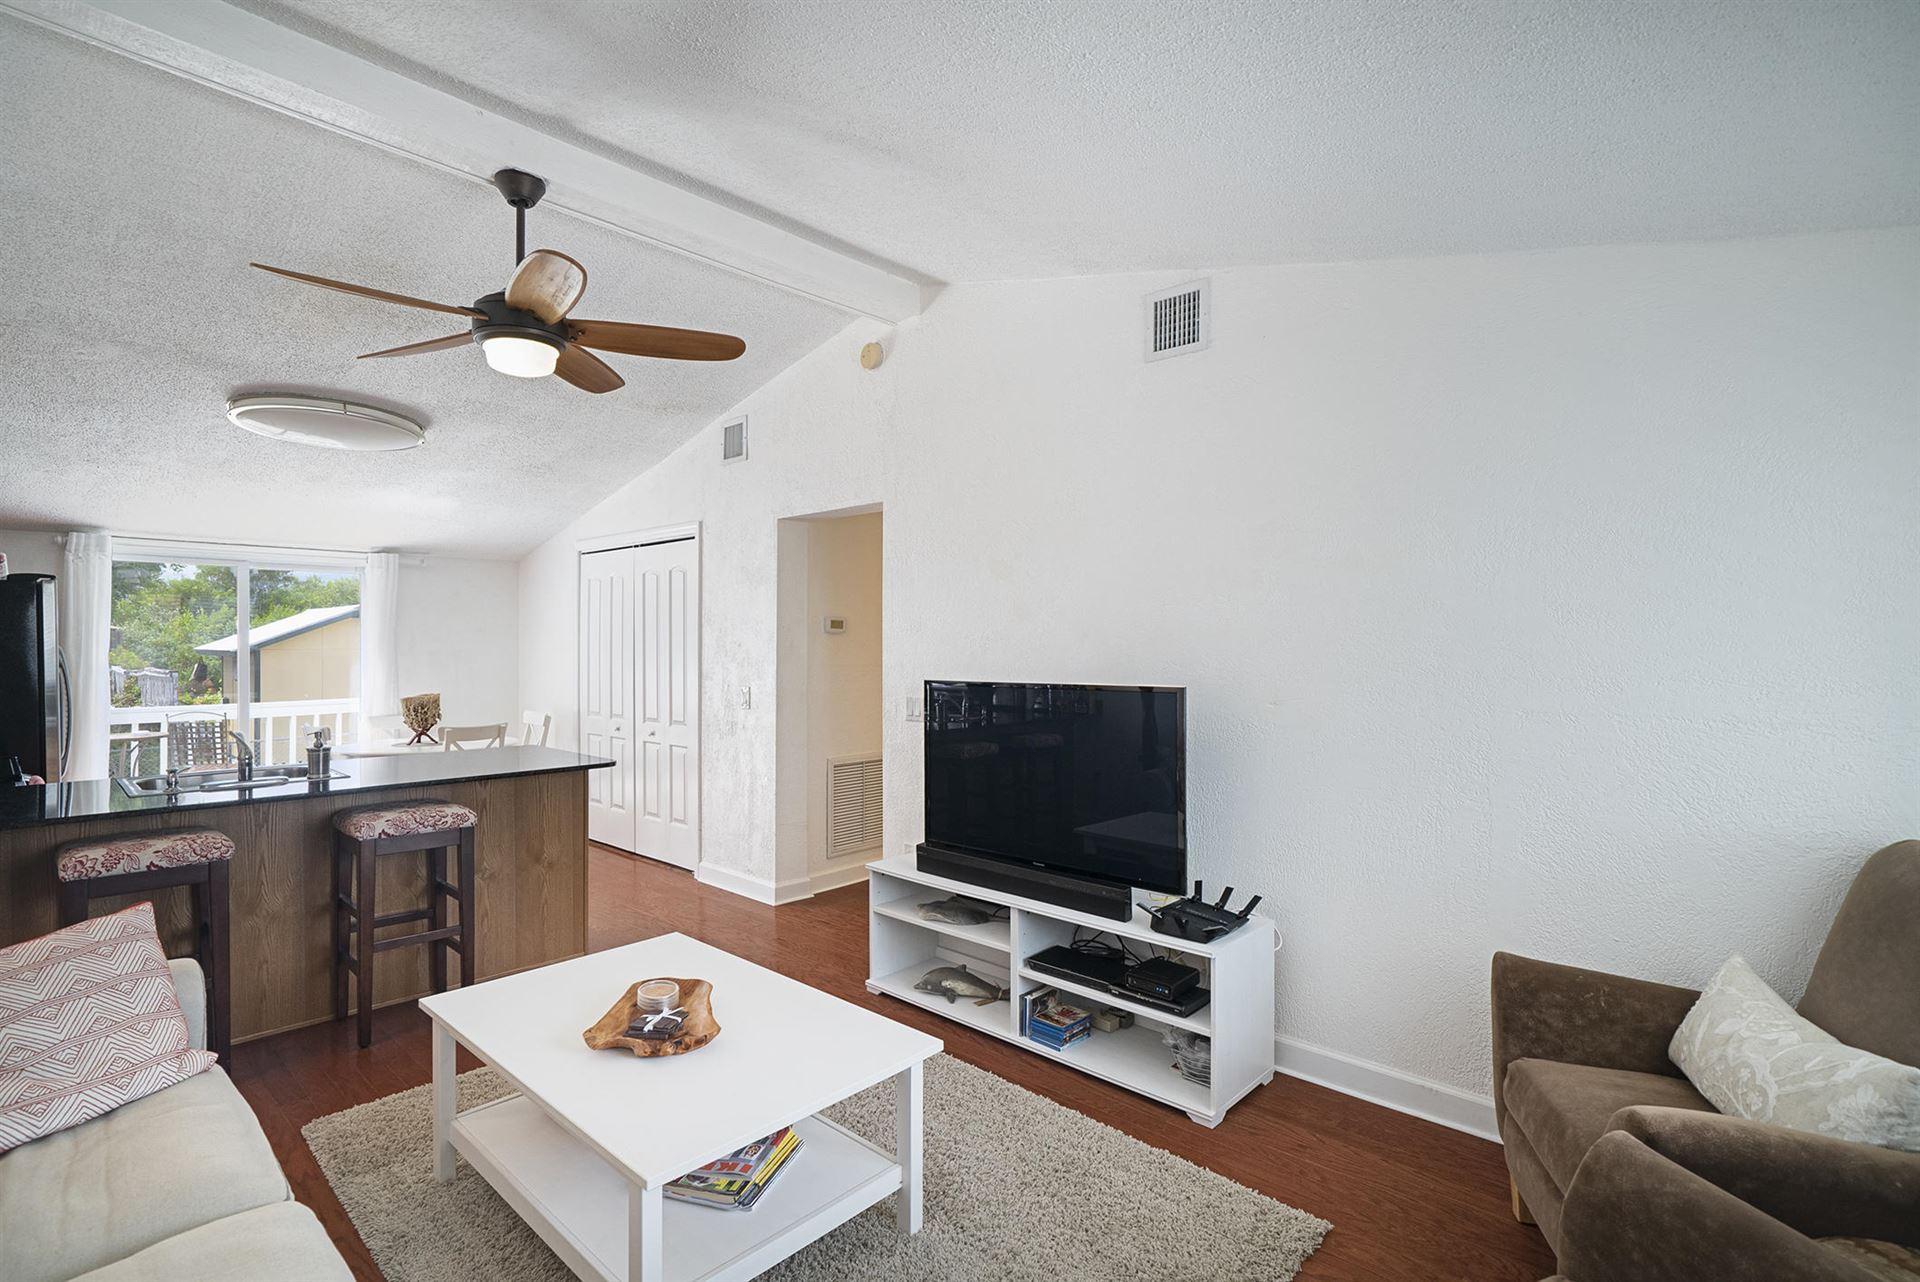 260 Sands Road, Big Pine, FL 33043 - #: 592521